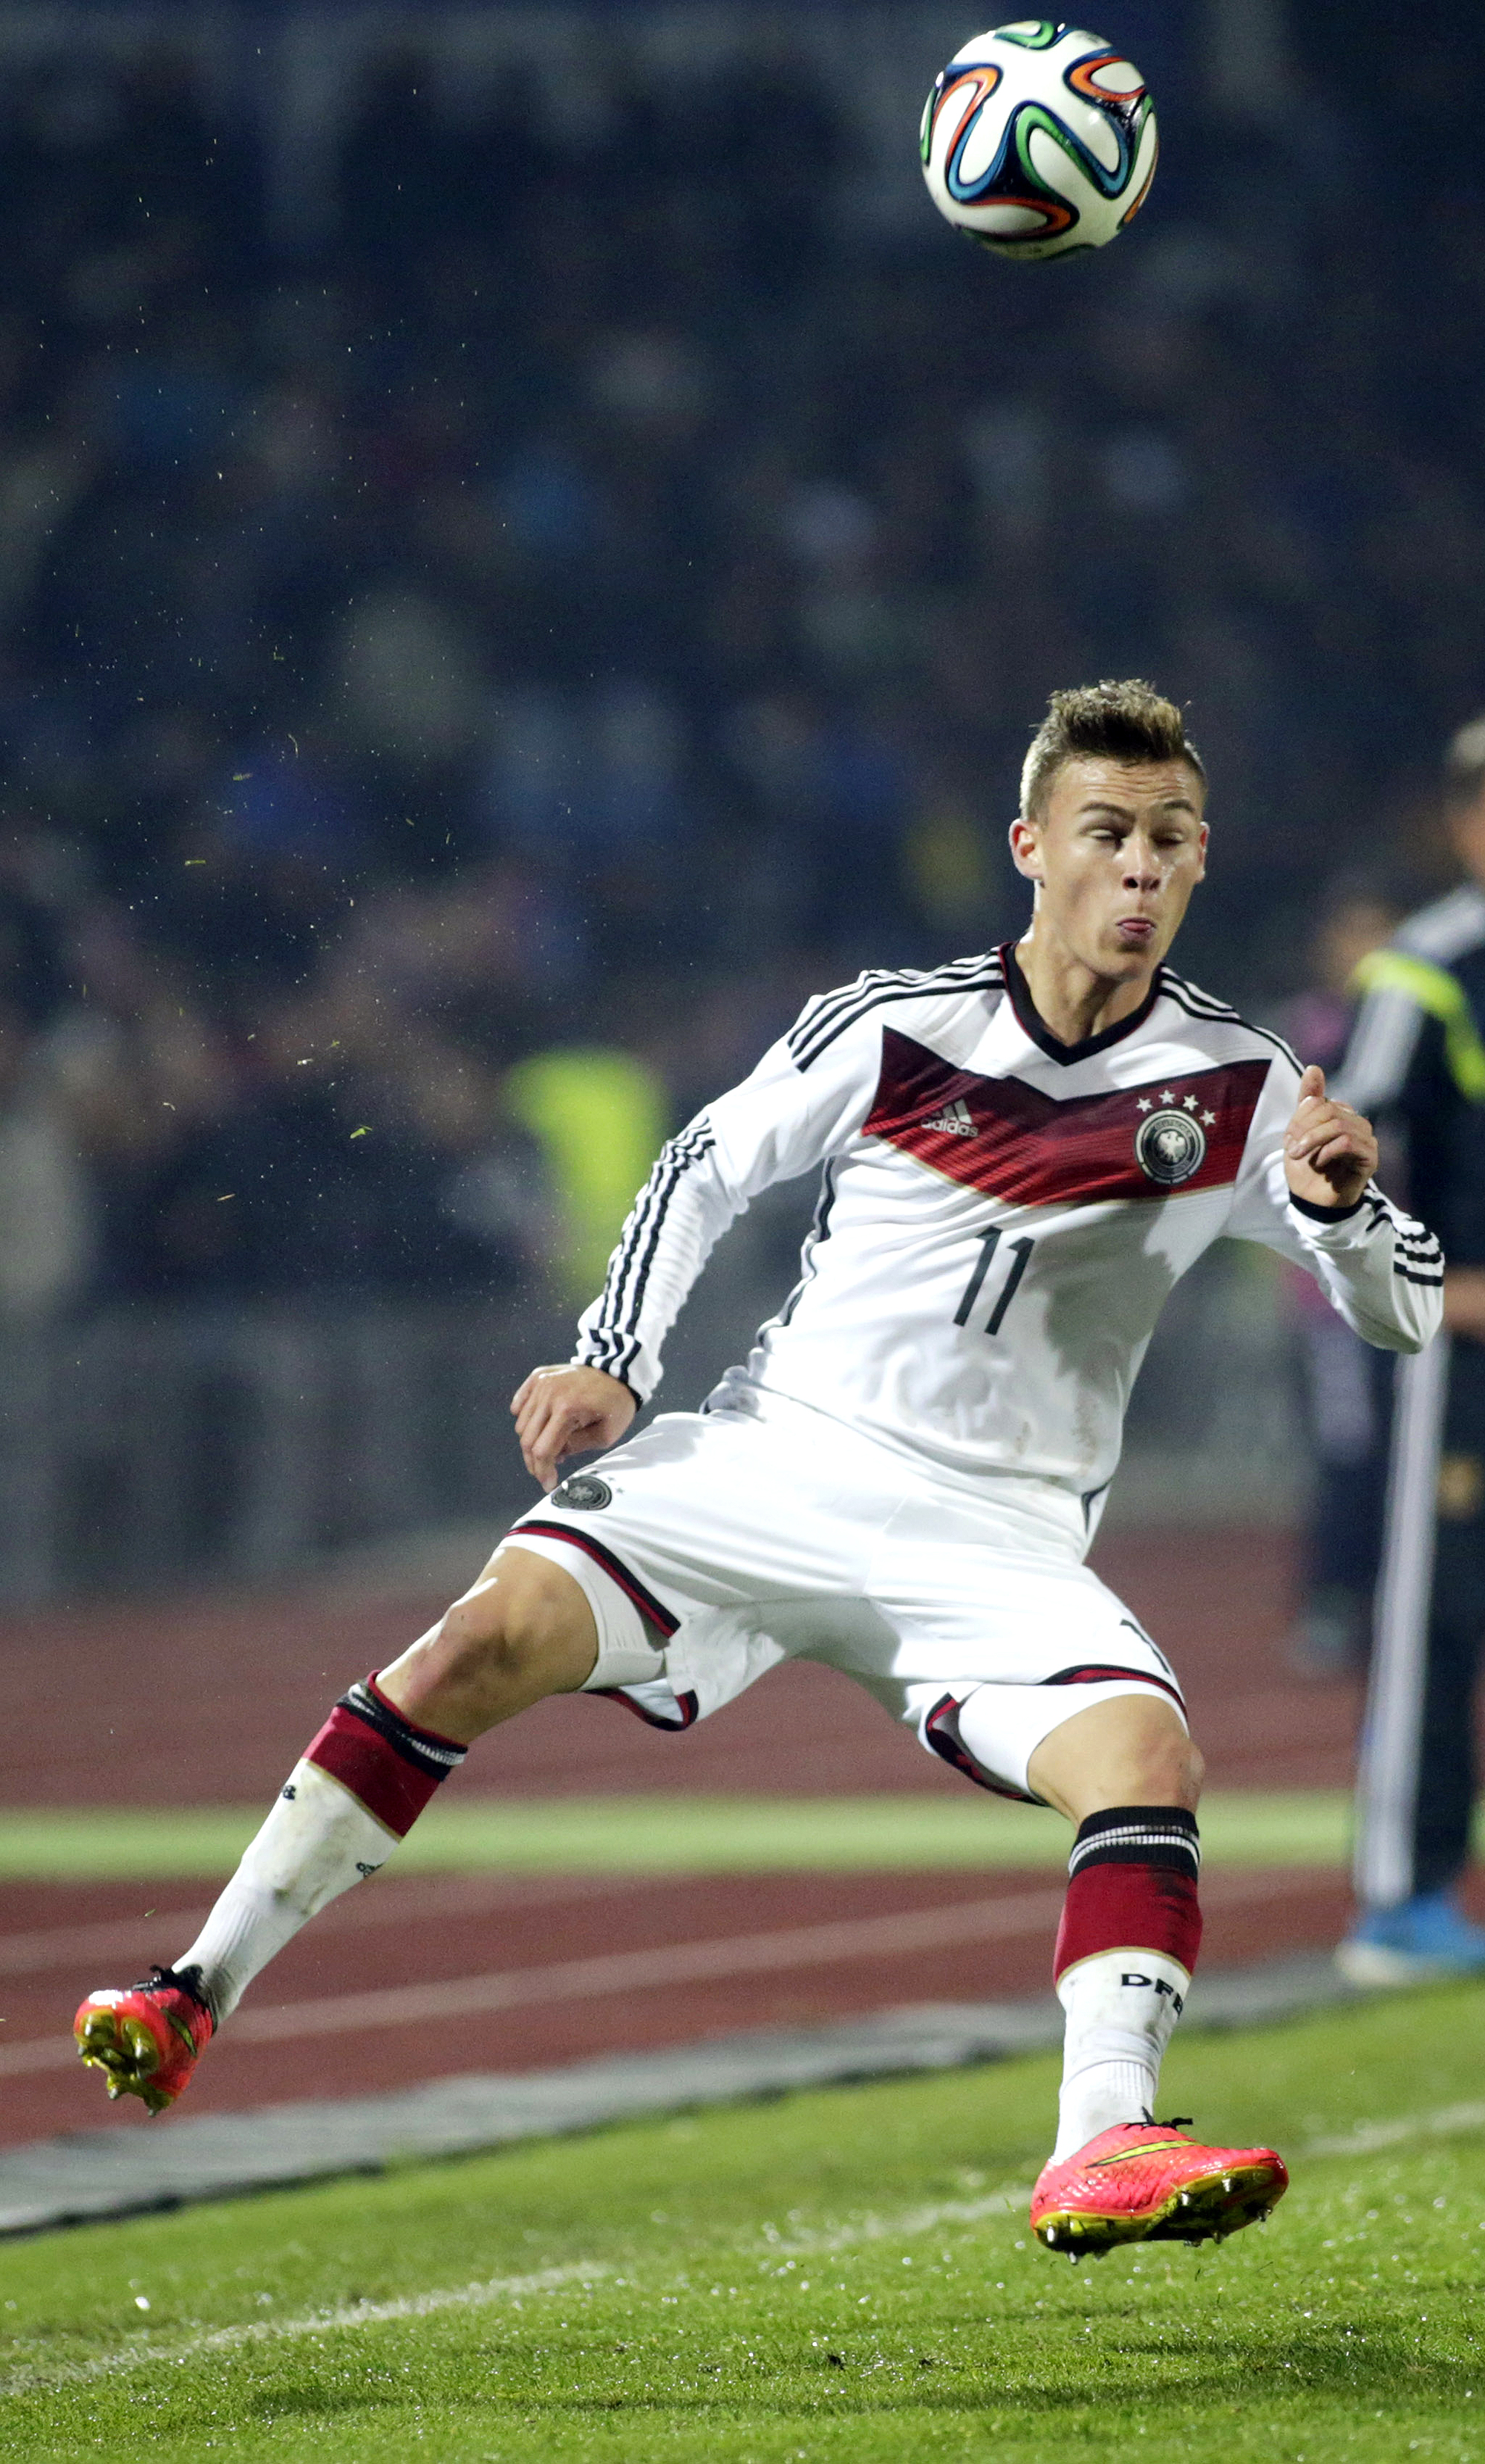 Bayern anuncia acerto com promessa alemã indicada por Pep Guardiola 6395f3933dffb